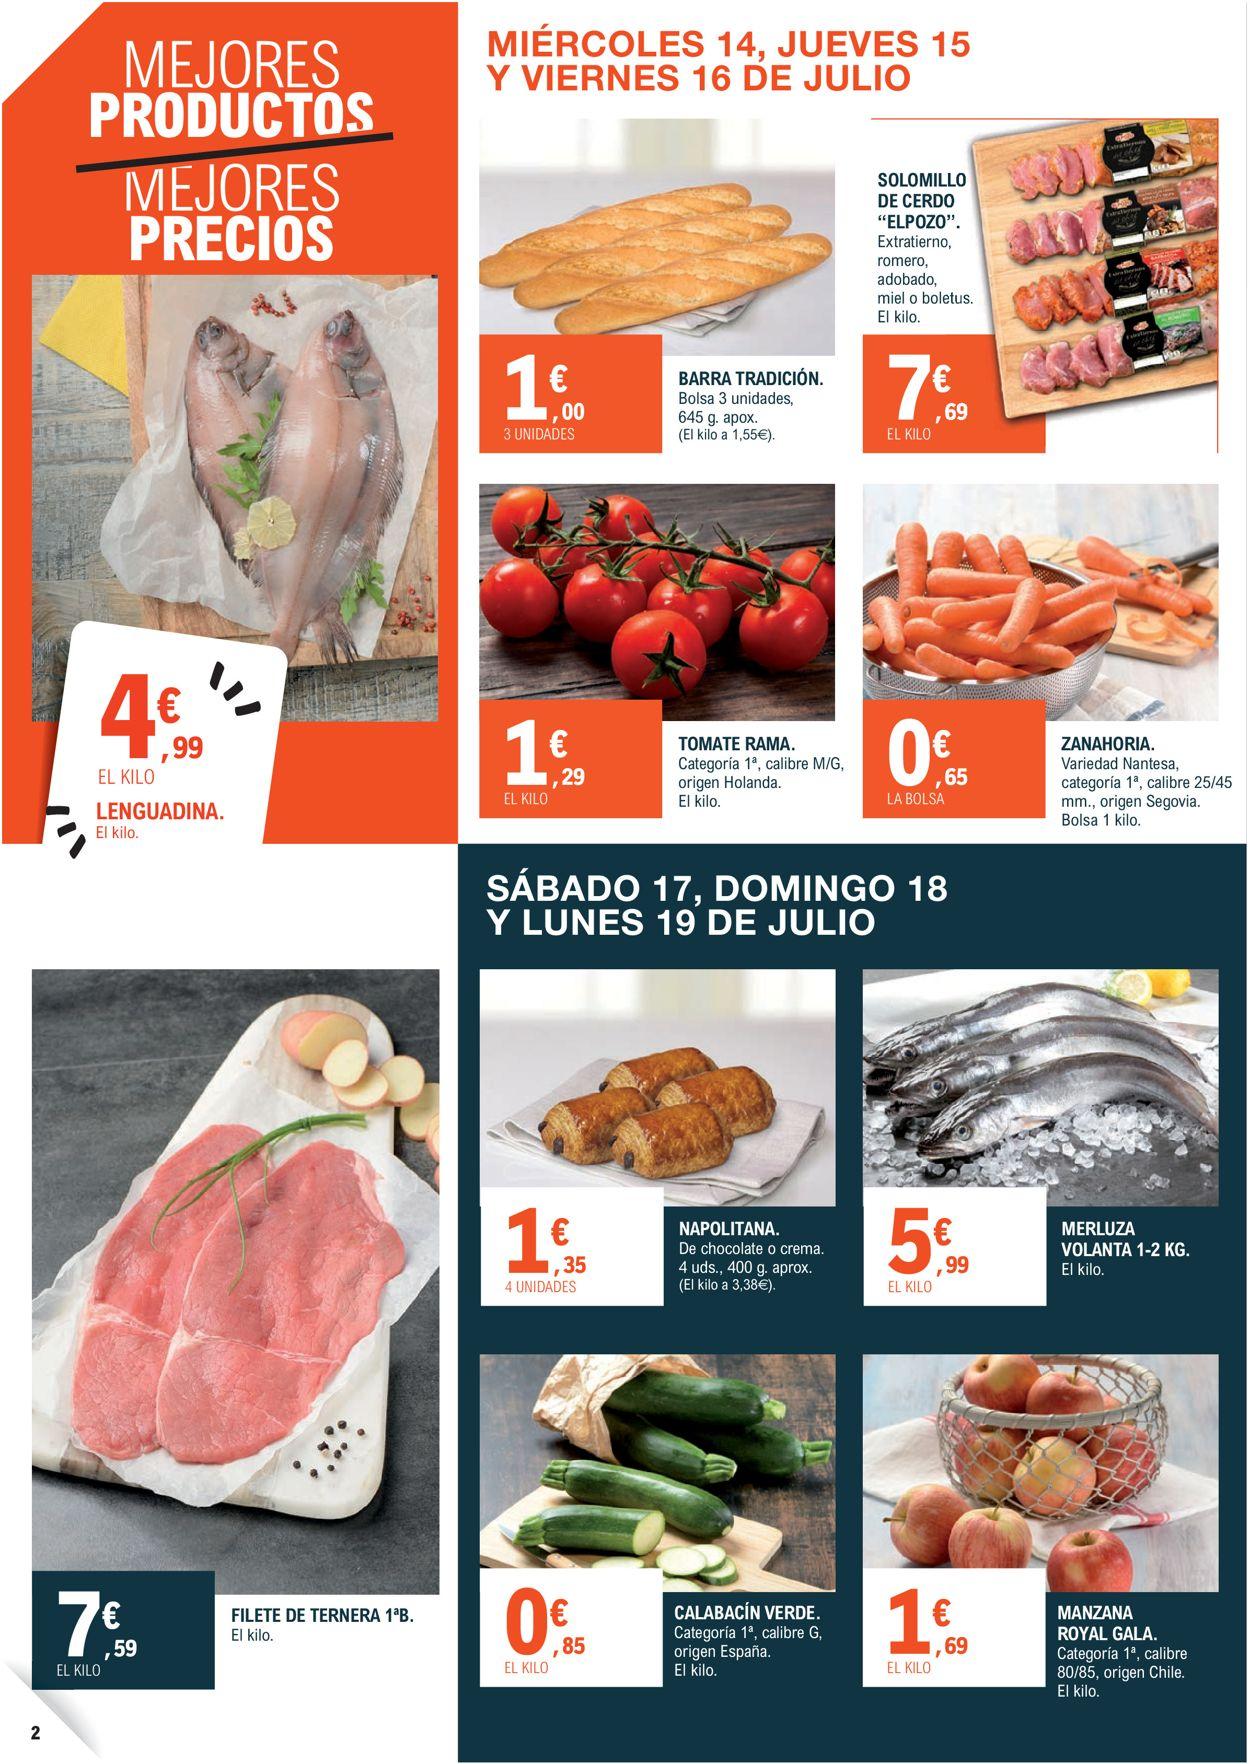 E.leclerc Folleto - 14.07-25.07.2021 (Página 2)